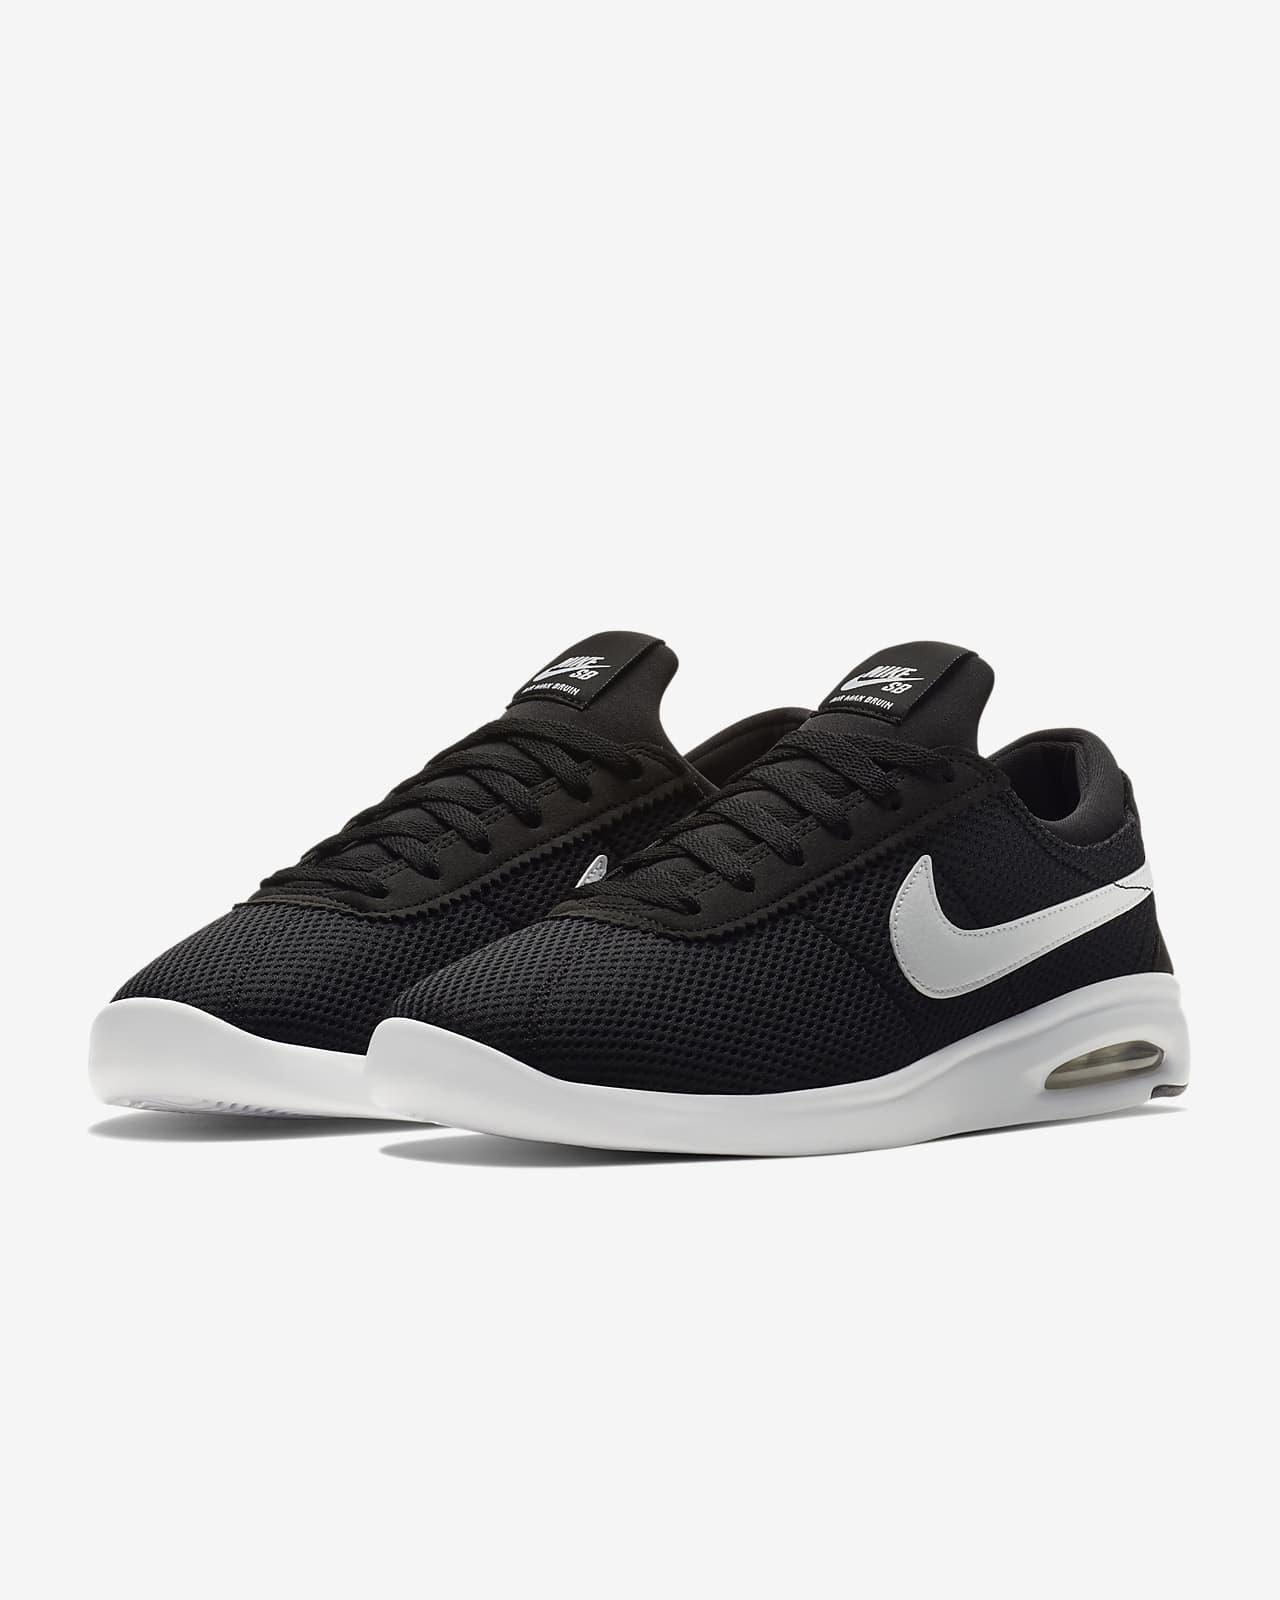 Nike SB Air Max Bruin Vapor Men's Skate Shoe